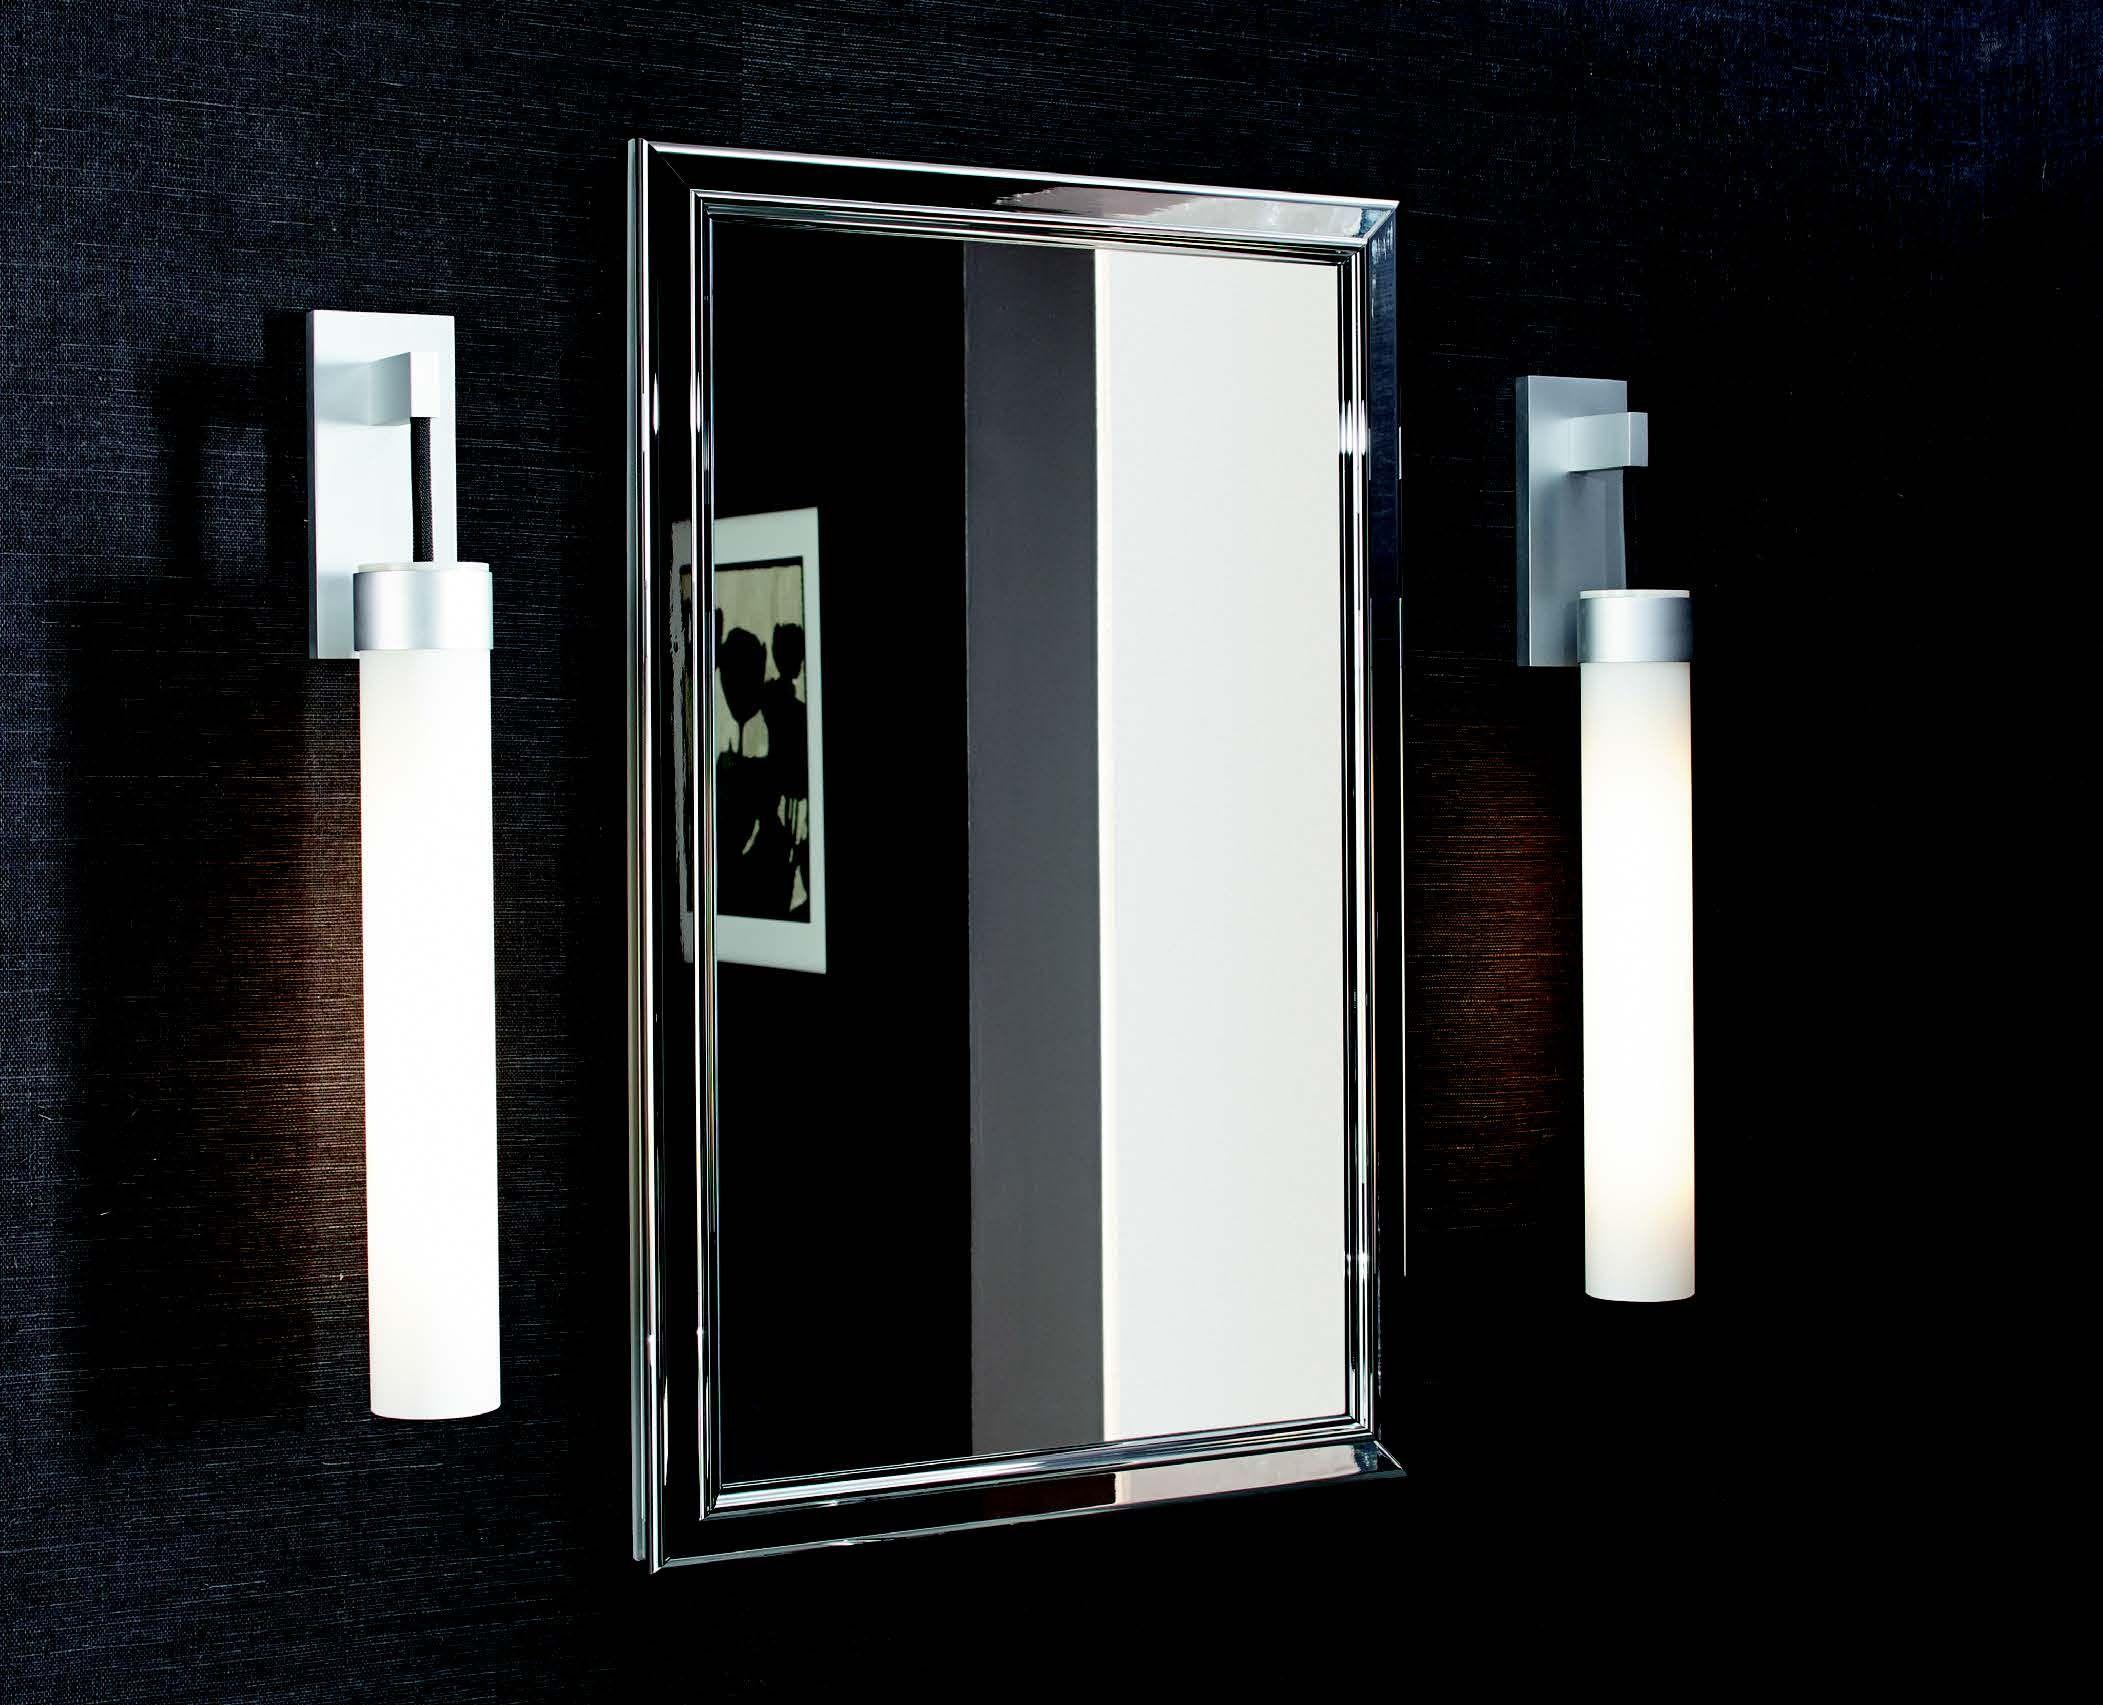 Master bathroomsROB 13002 Sell Sheet Main Line Cabinets US jpg 2 103 1 705 pixels  . Robern Bathroom Medicine Cabinets. Home Design Ideas